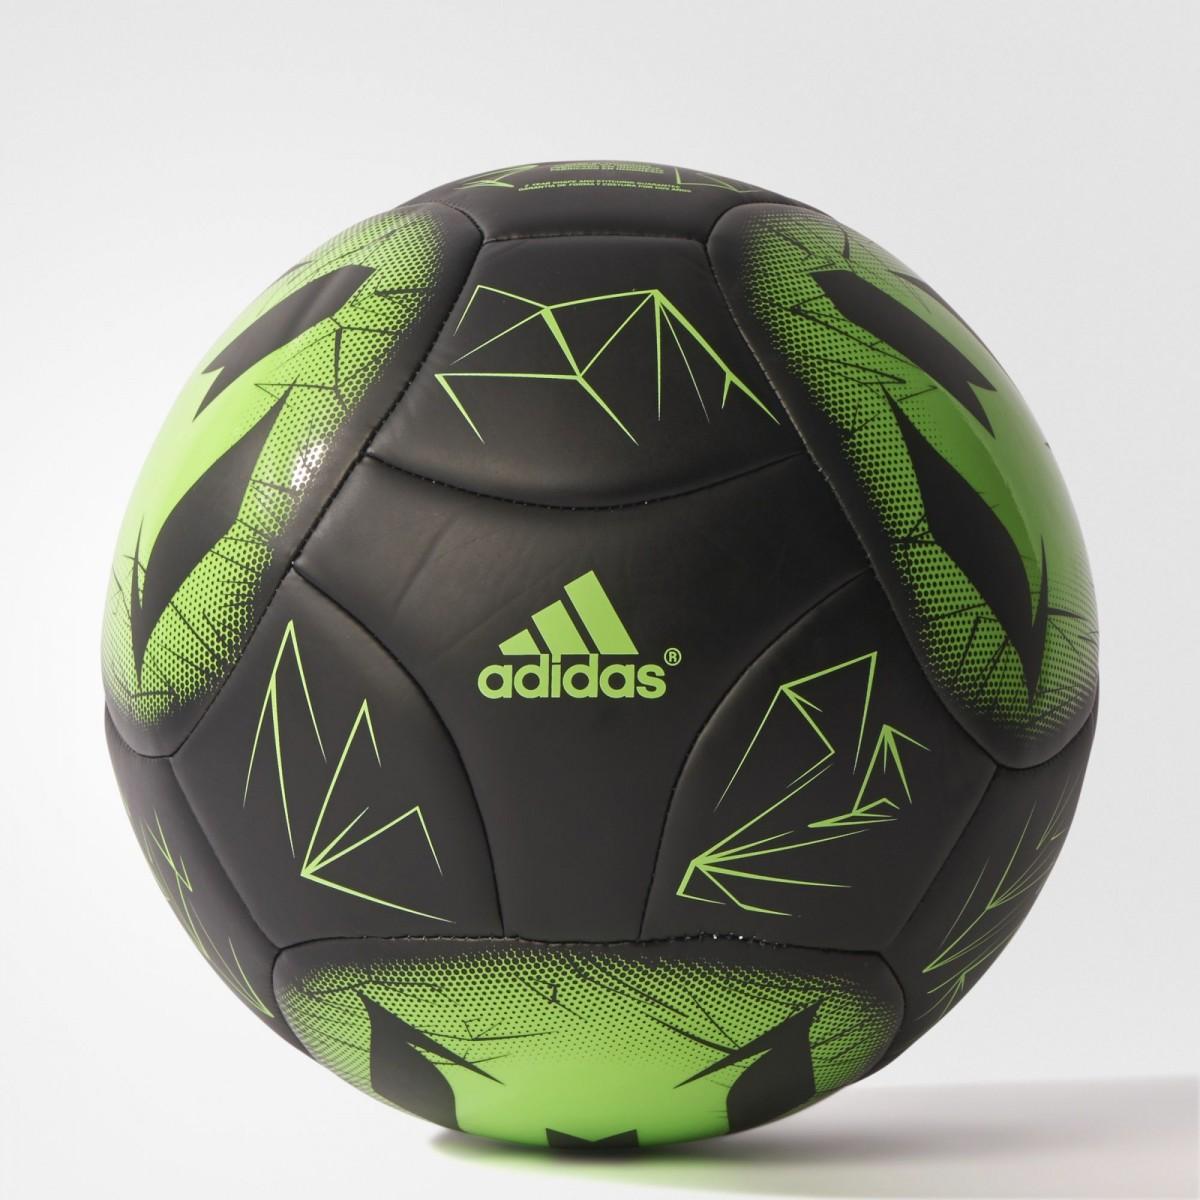 cfa9aec9a6 Bizz Store - Bola Futebol de Campo Adidas Messi Preto Verde